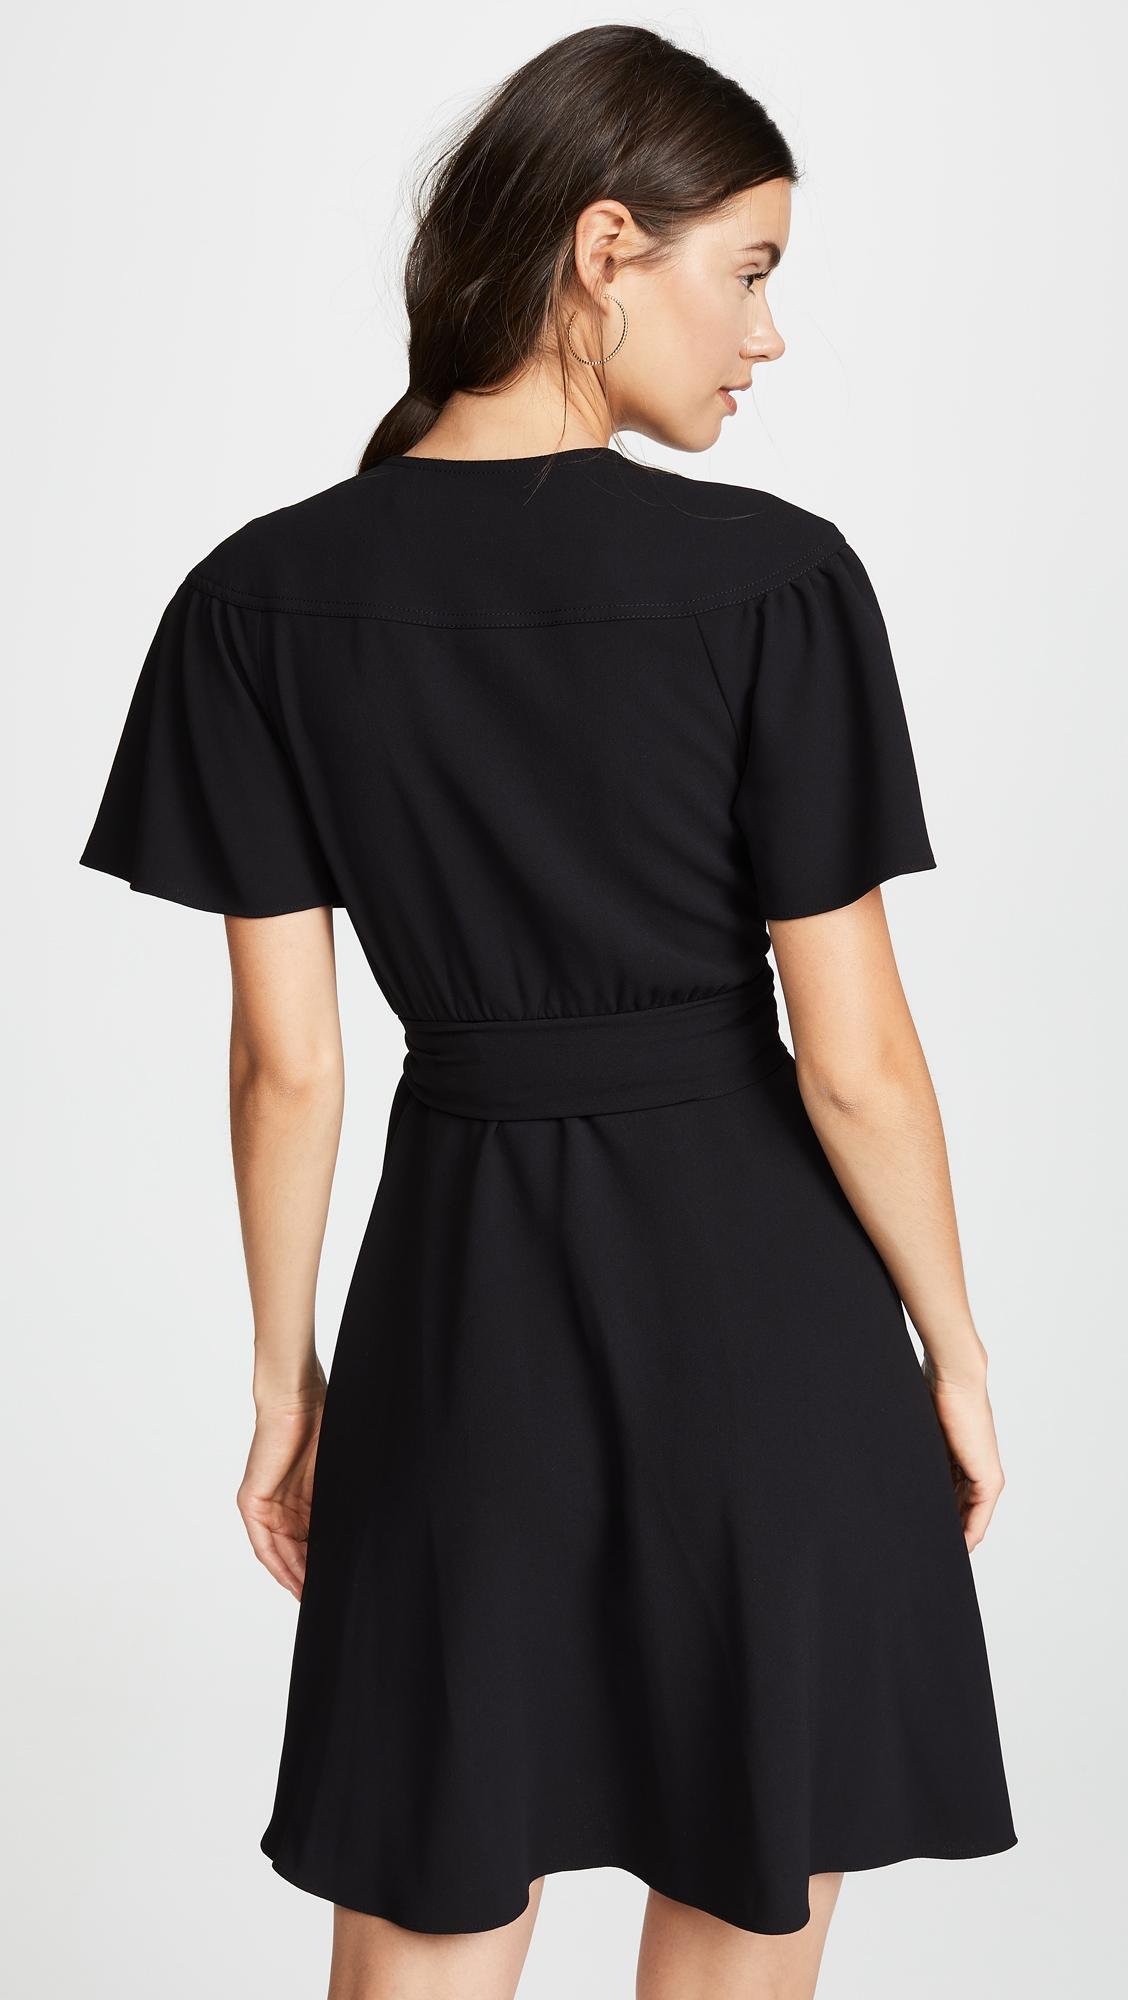 6b53413e5f Diane von Furstenberg - Black Zella Dress - Lyst. View fullscreen